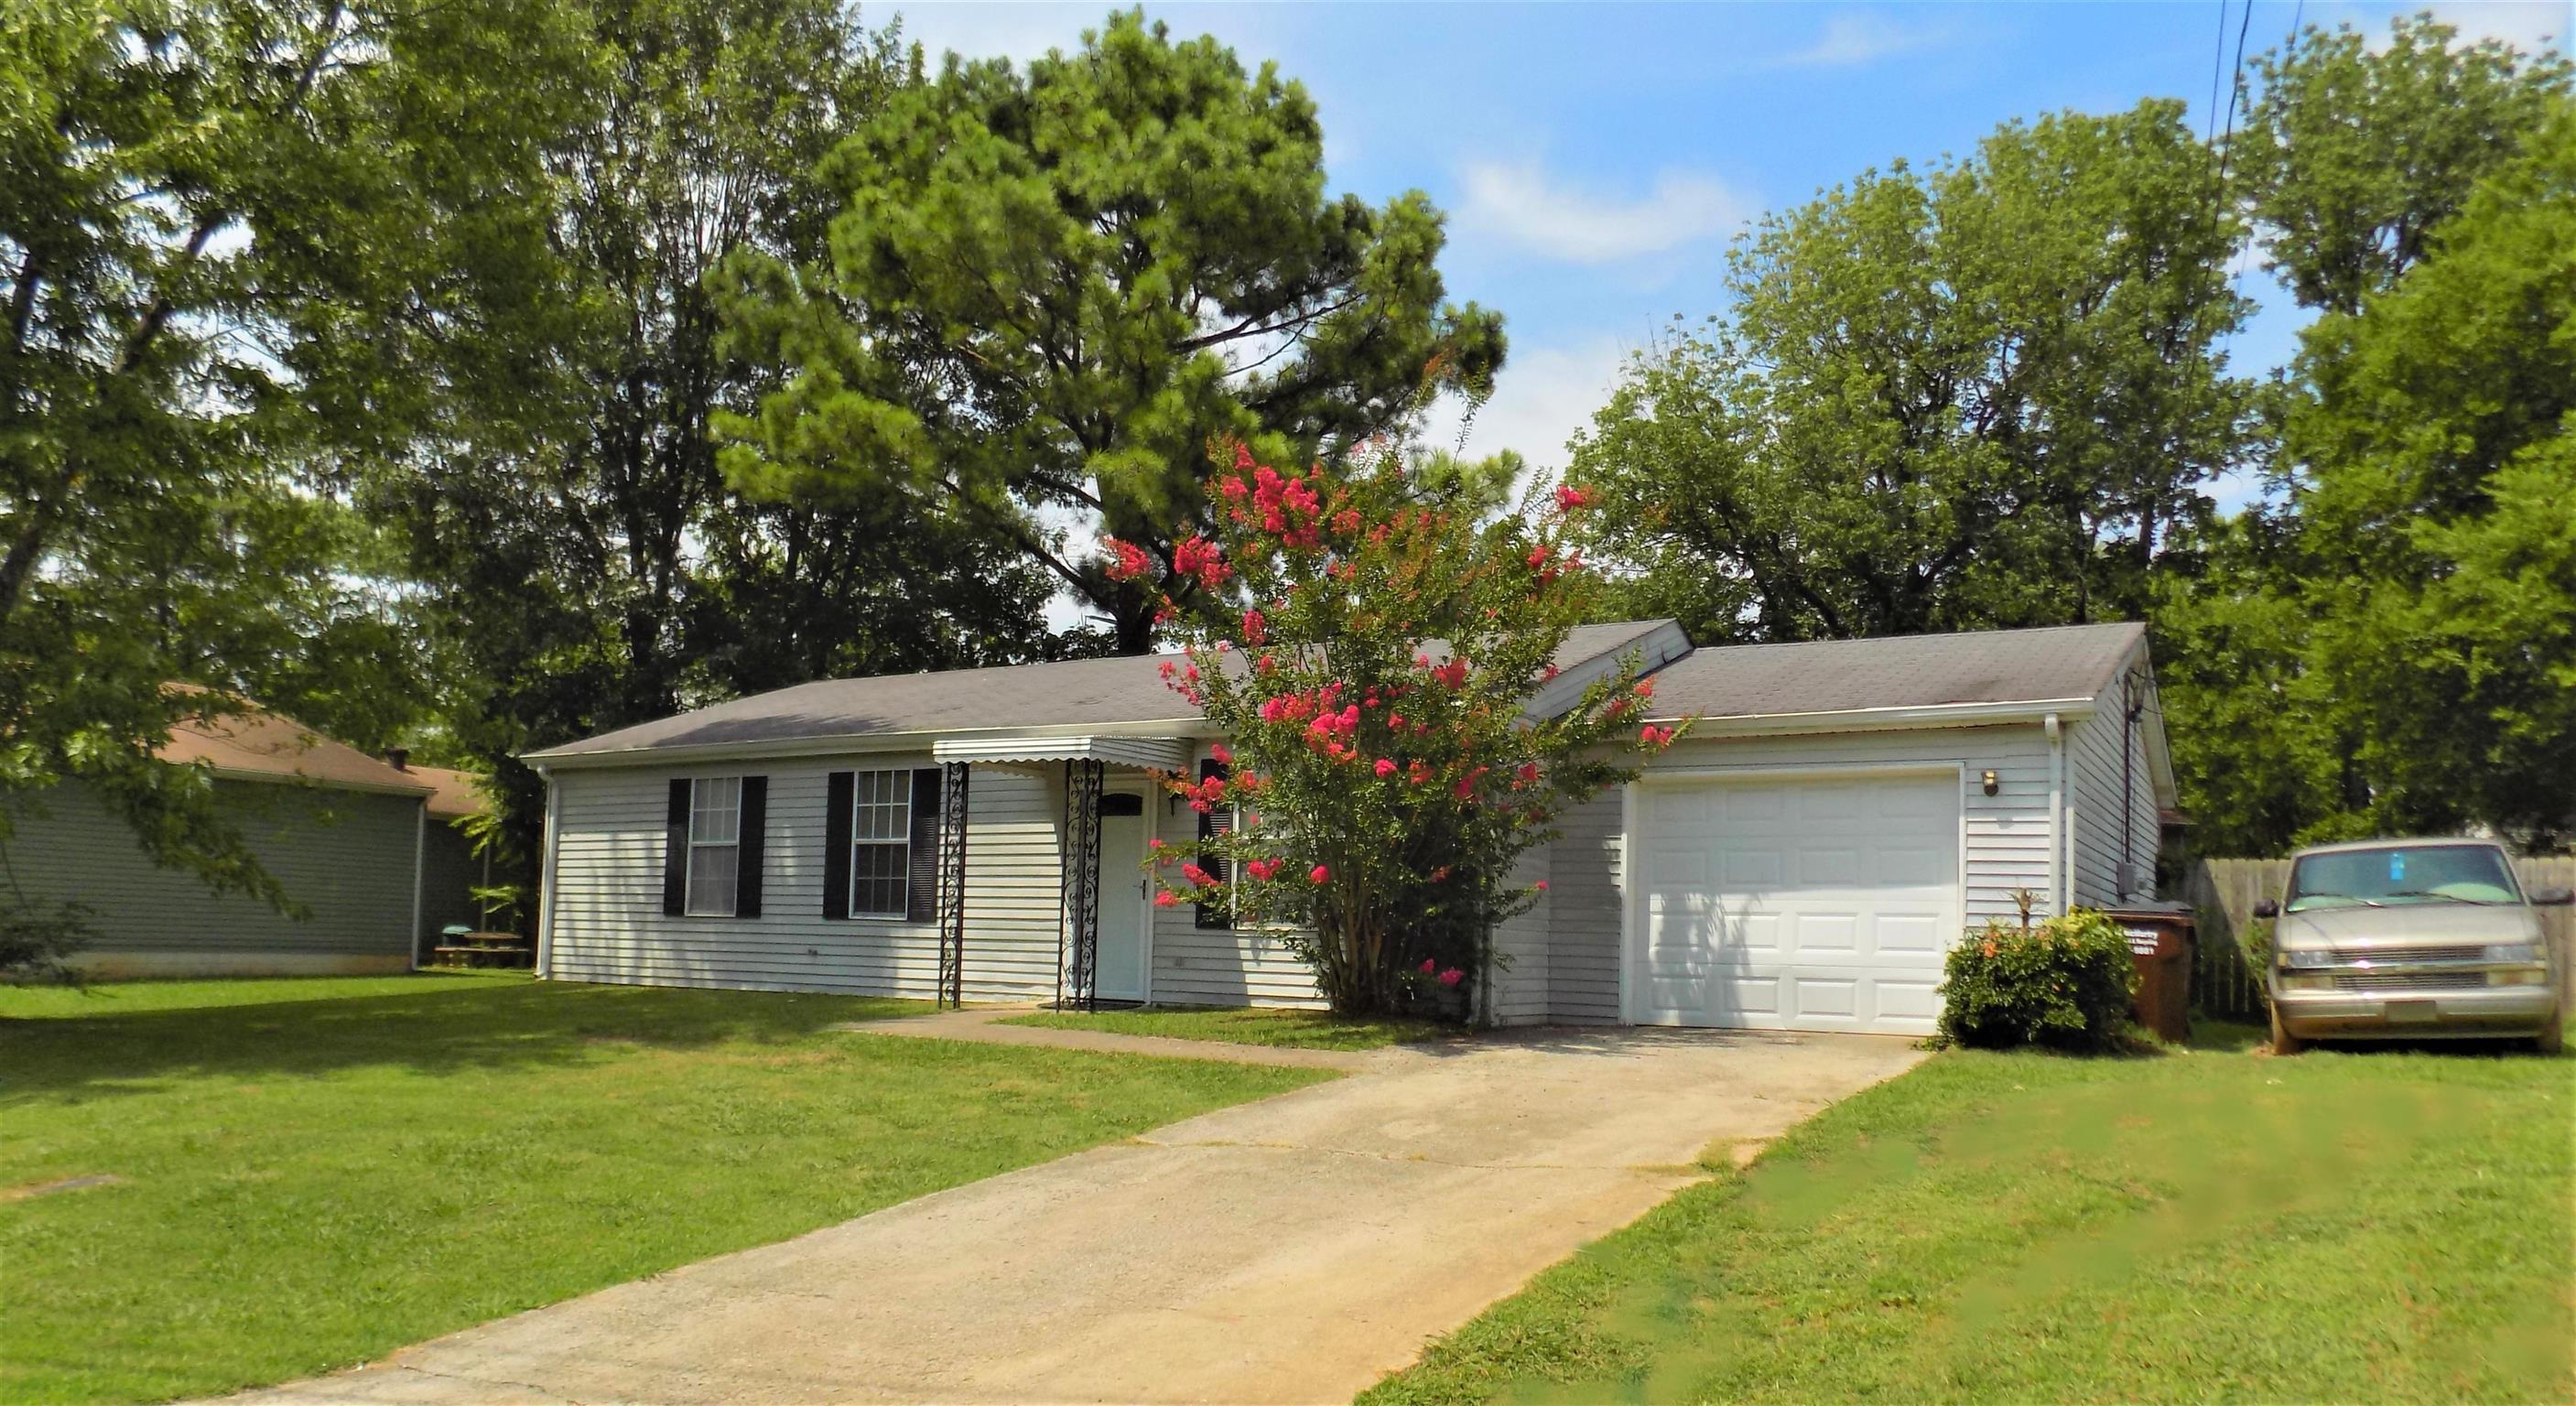 257 Warrior Rd, Madison, TN 37115 - Madison, TN real estate listing